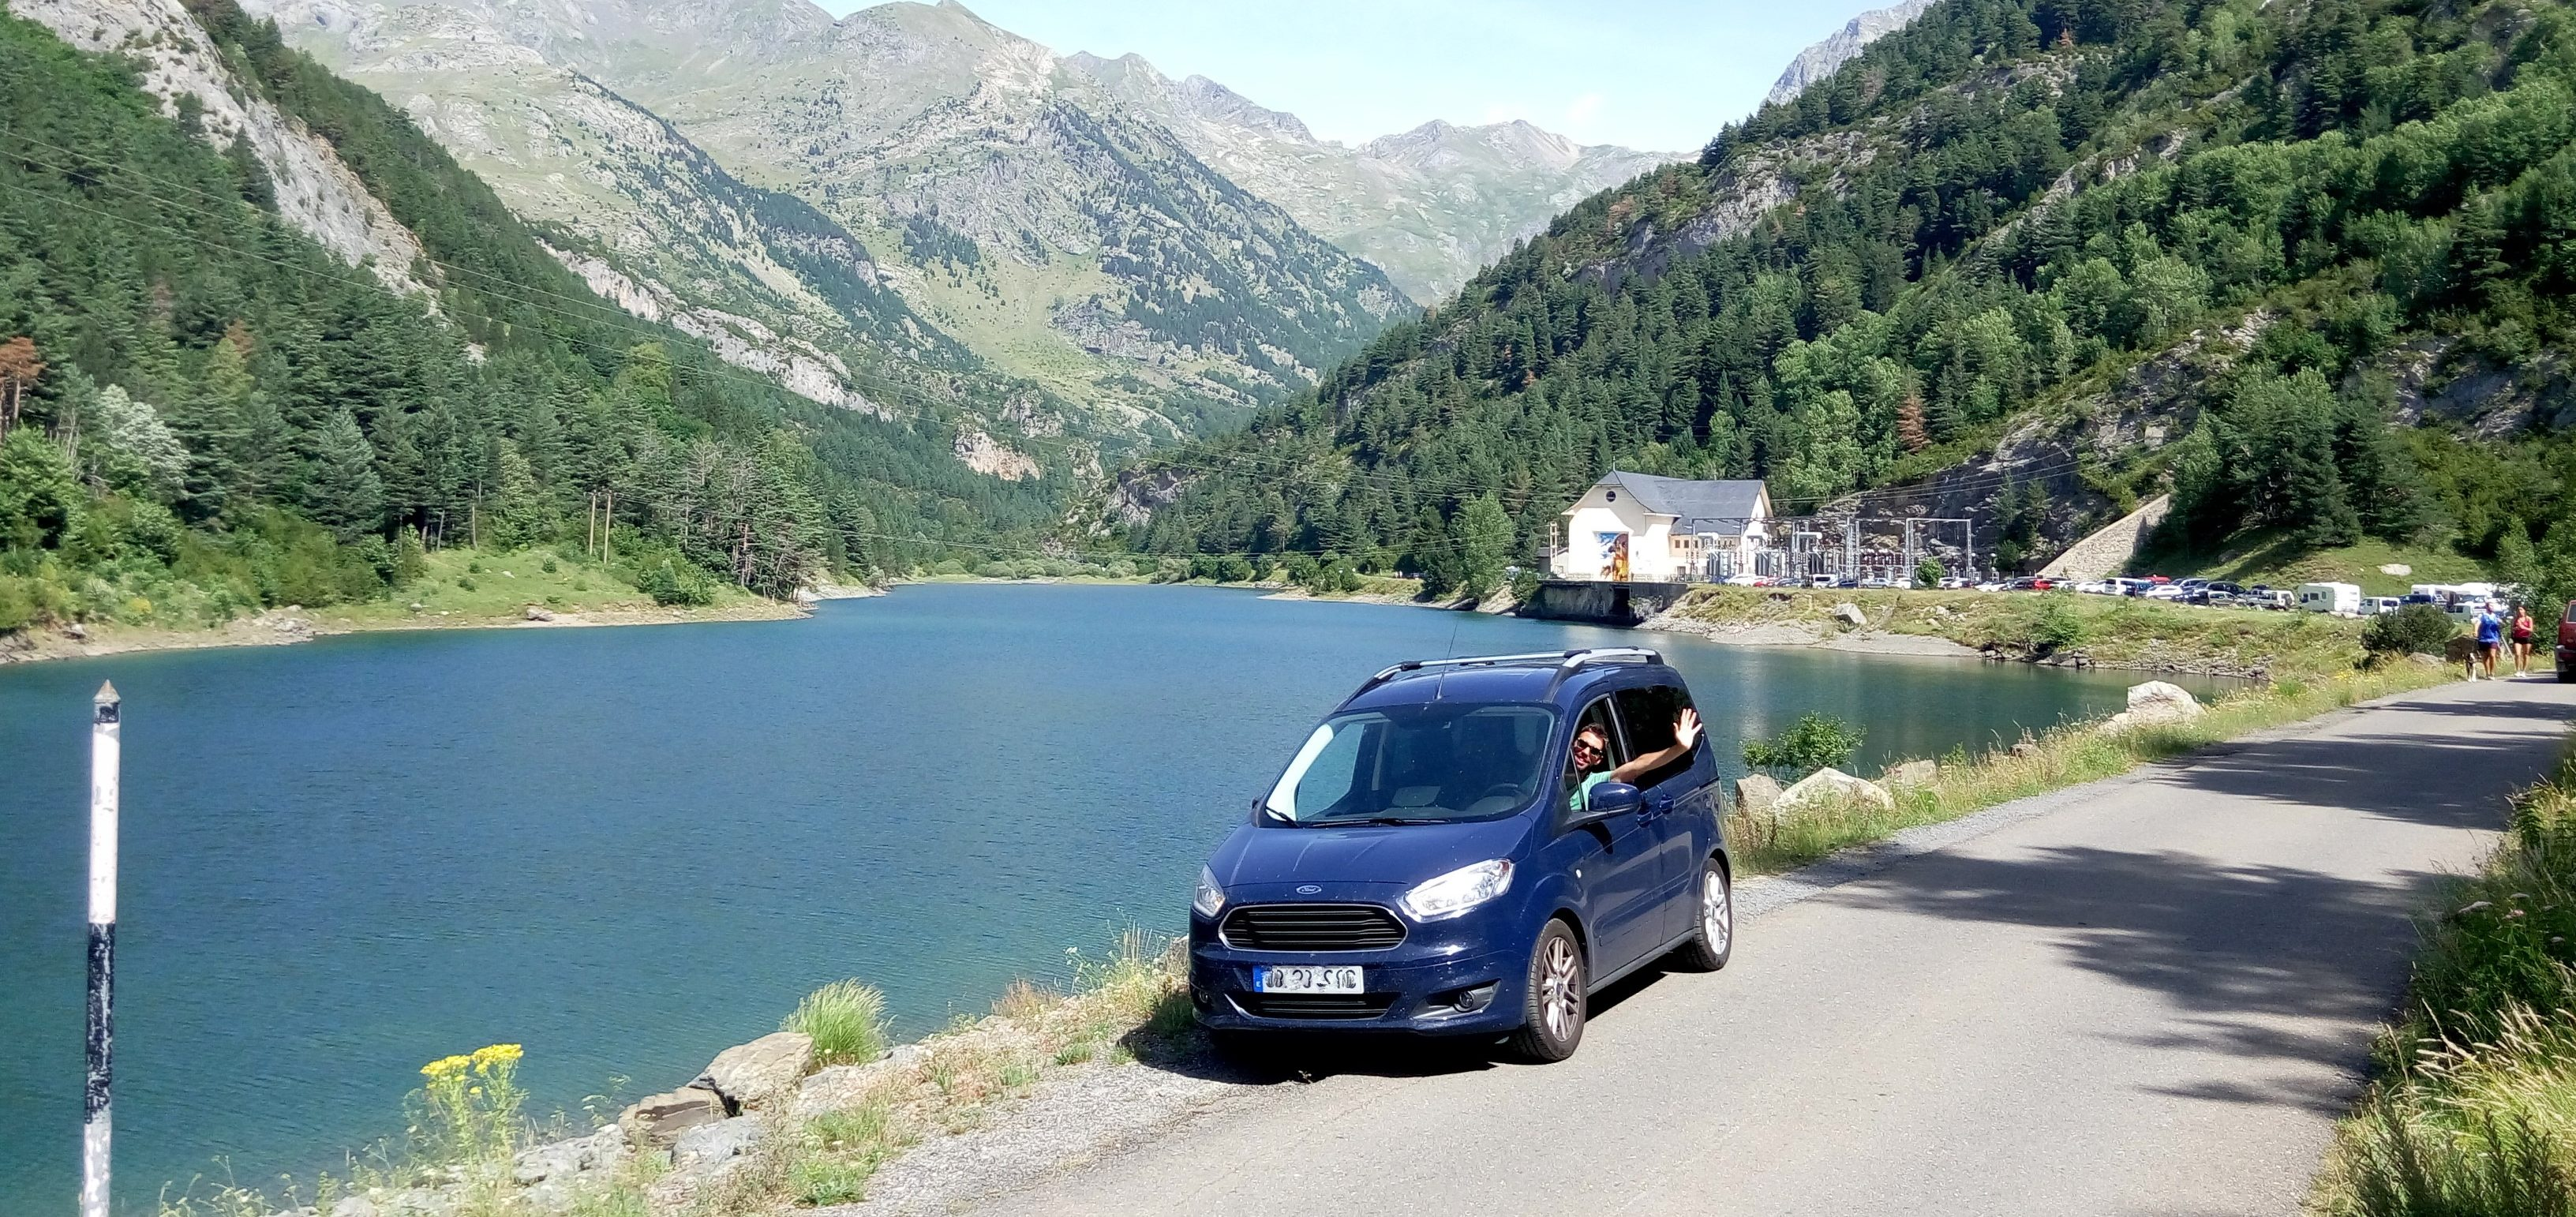 Pinaretta - Ford Couriel camper